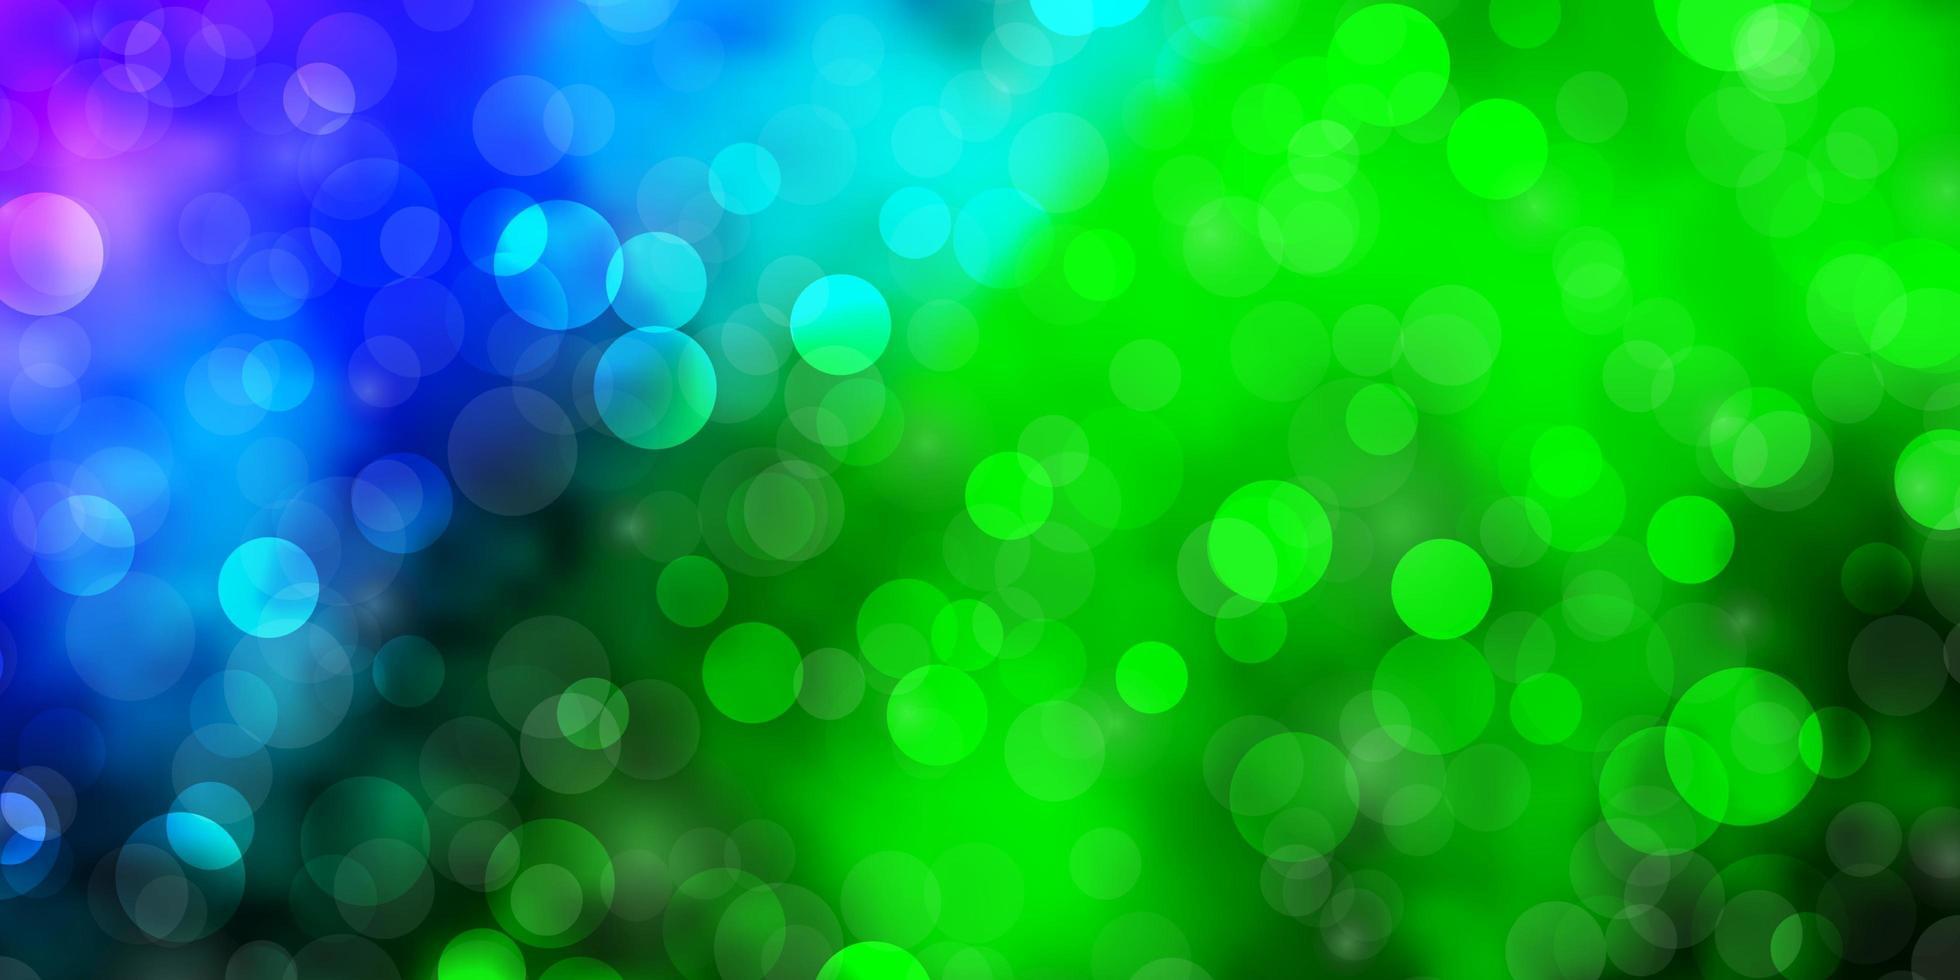 hellrosa, grüne Vektorschablone mit Kreisen. vektor